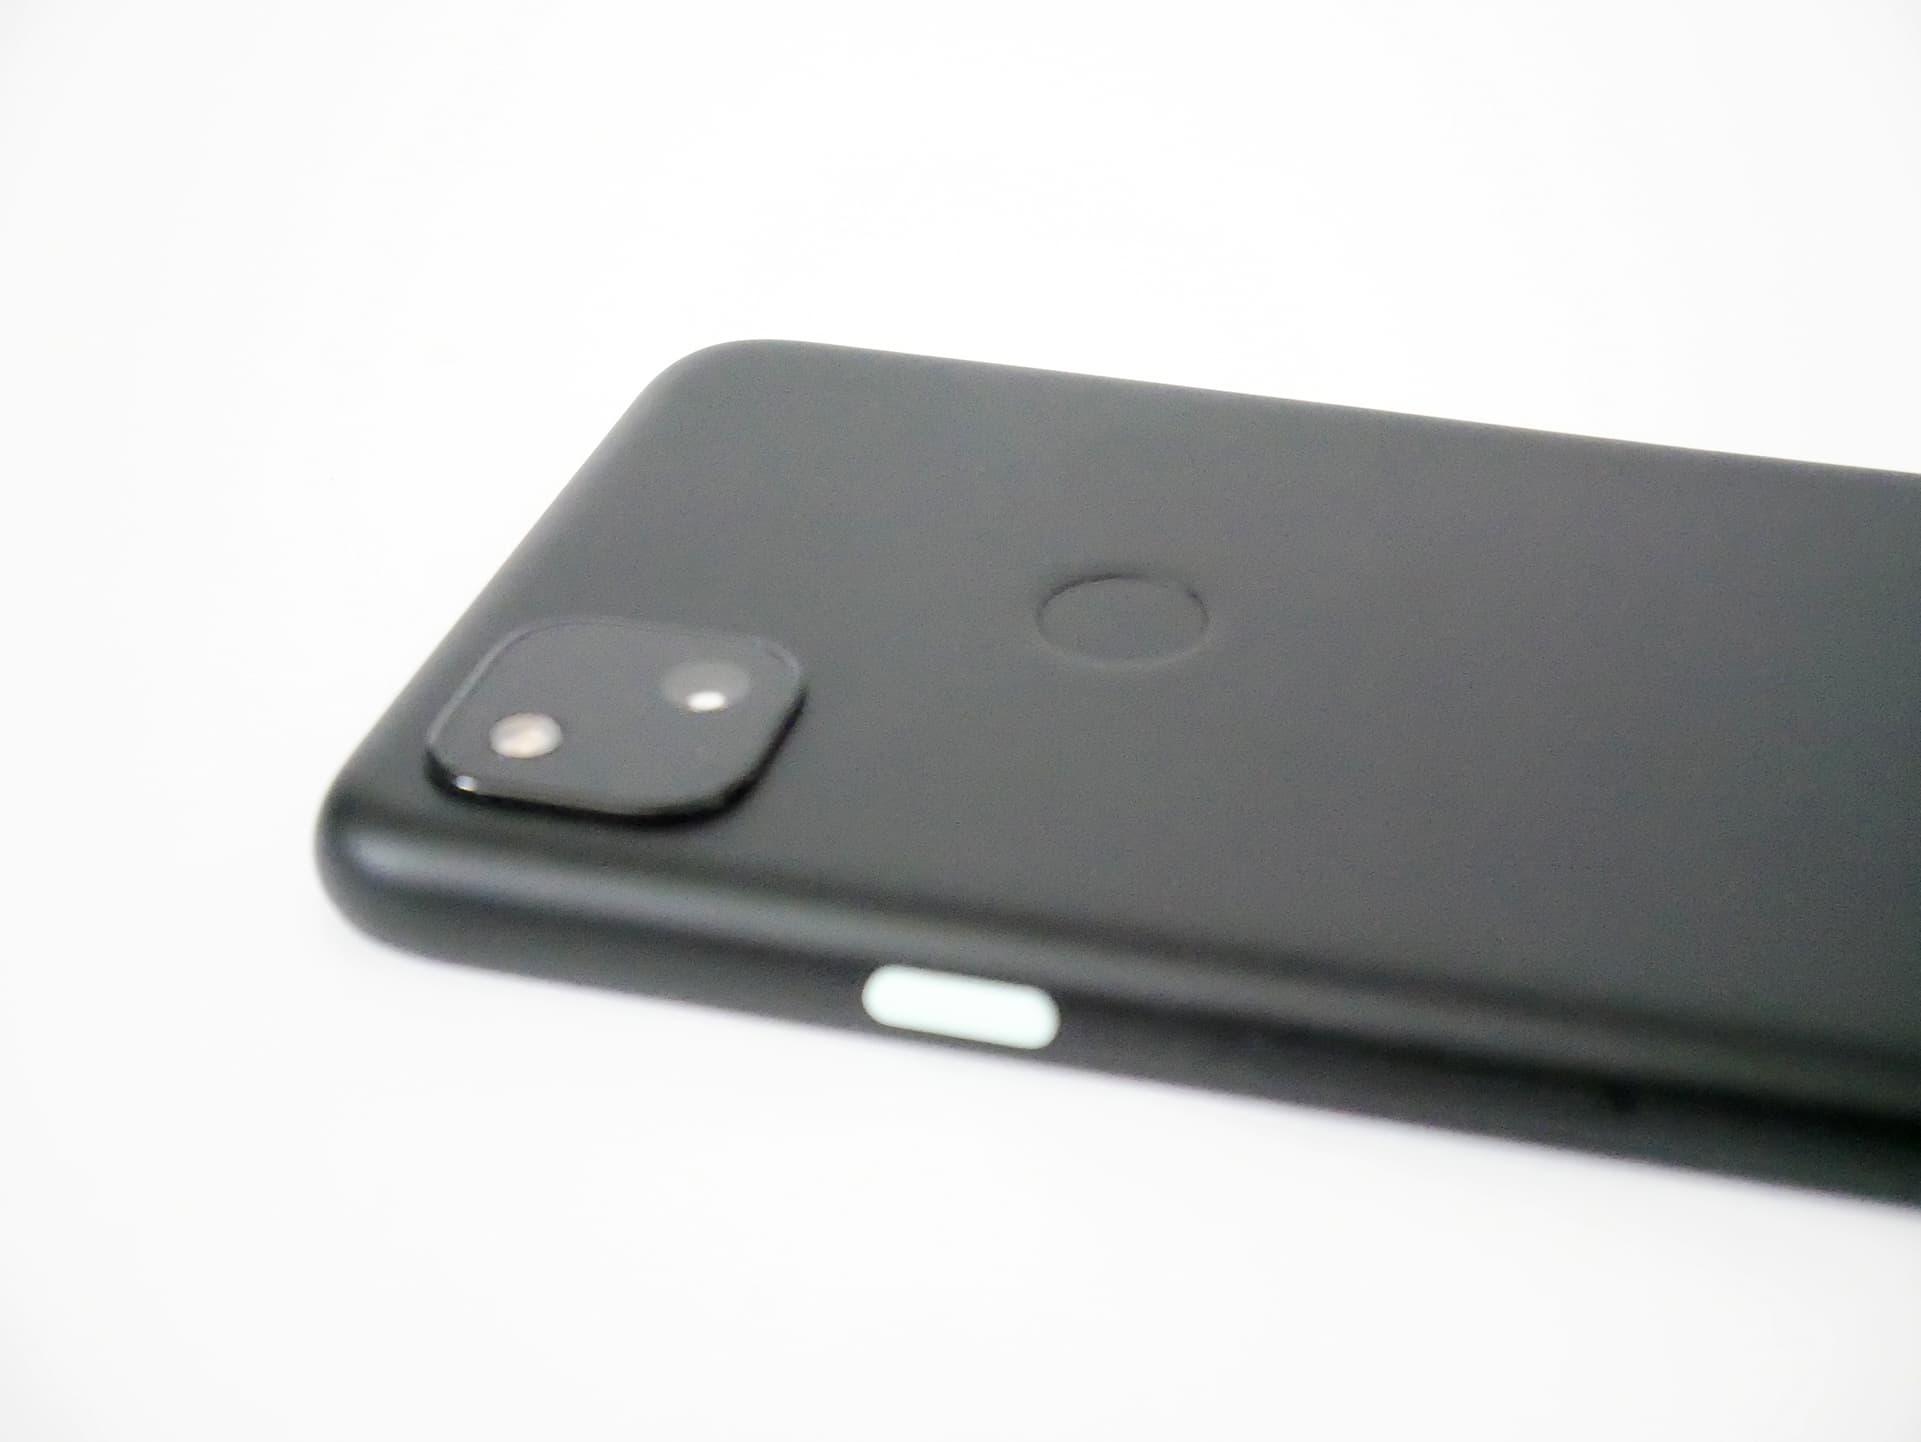 Pixel 4aの背面カメラと電源ボタン